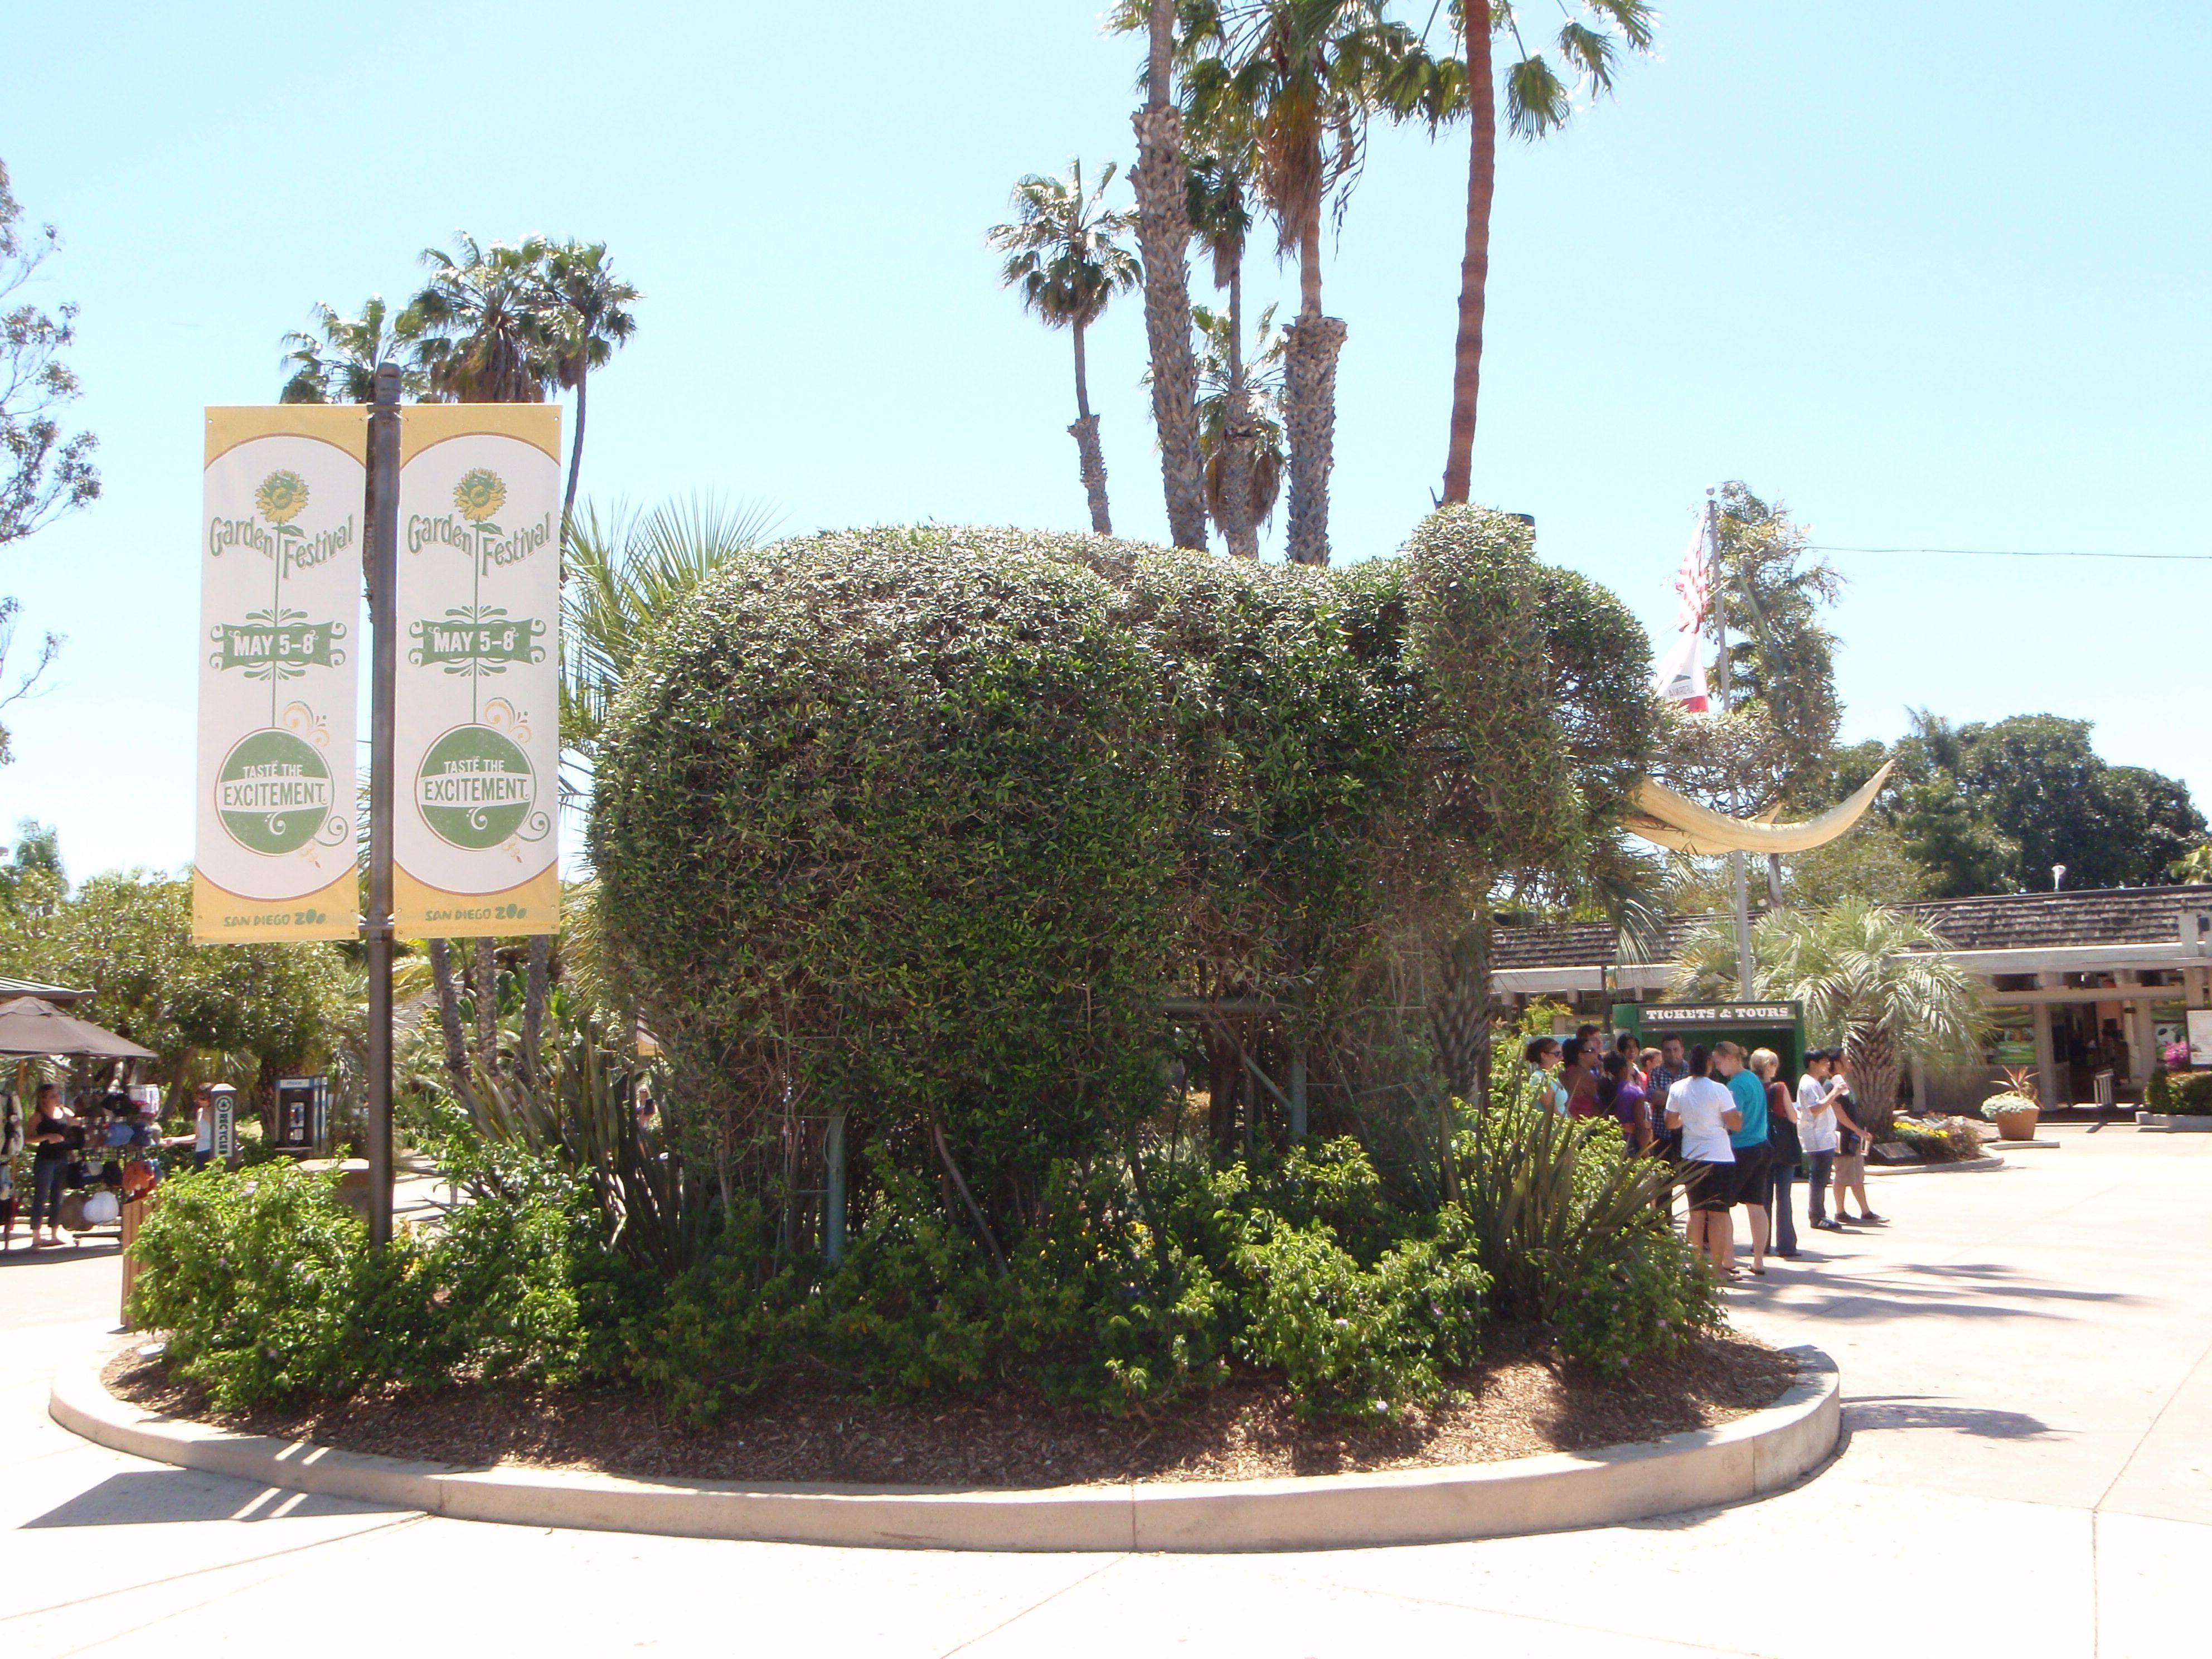 San Diego Zoo!  Fun trip with Kory and Kristine many years ago.